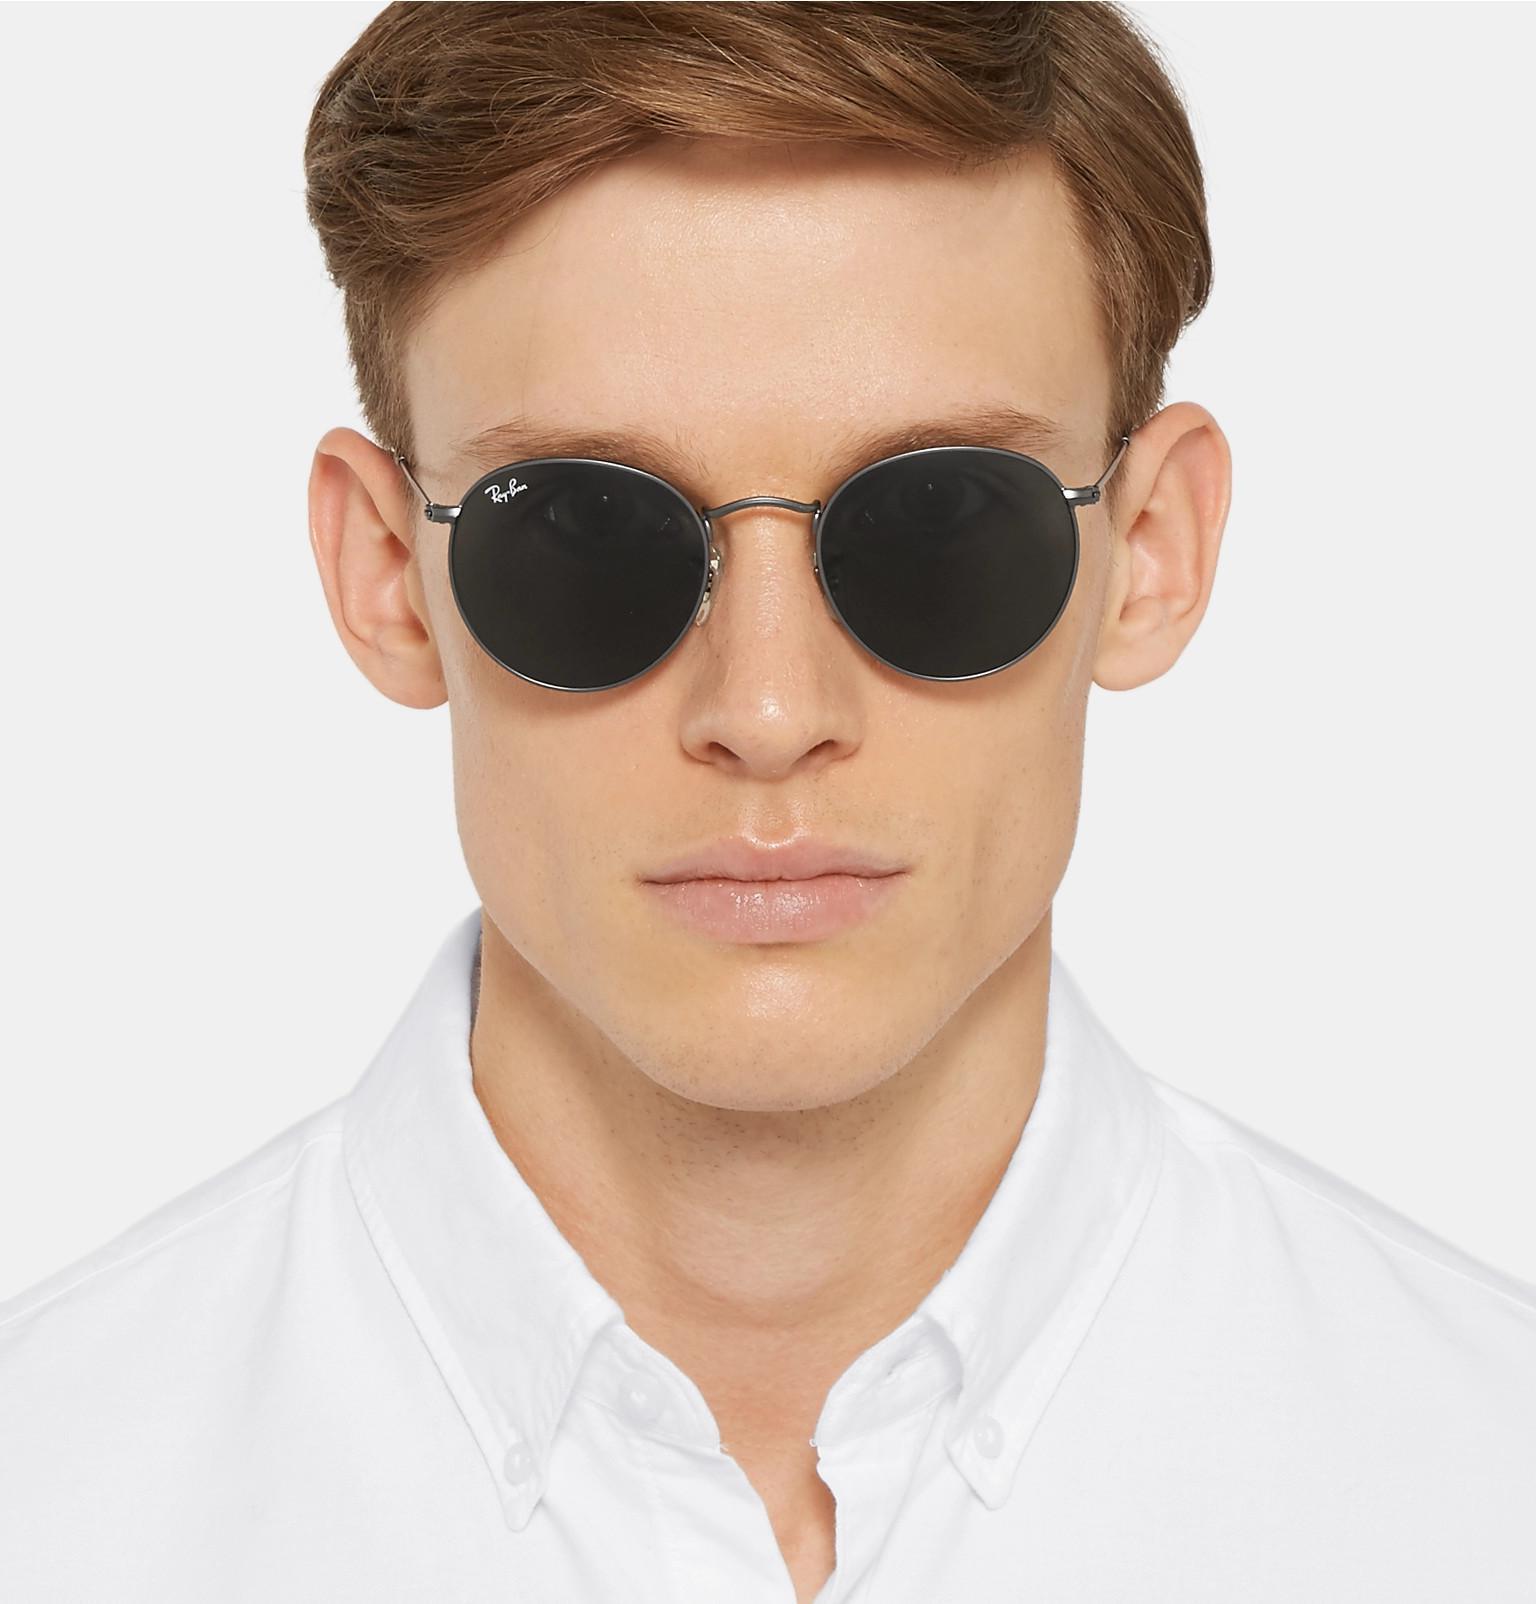 88023f74d9 Ray-Ban - Multicolor Round-frame Gunmetal-tone Sunglasses for Men - Lyst.  View fullscreen